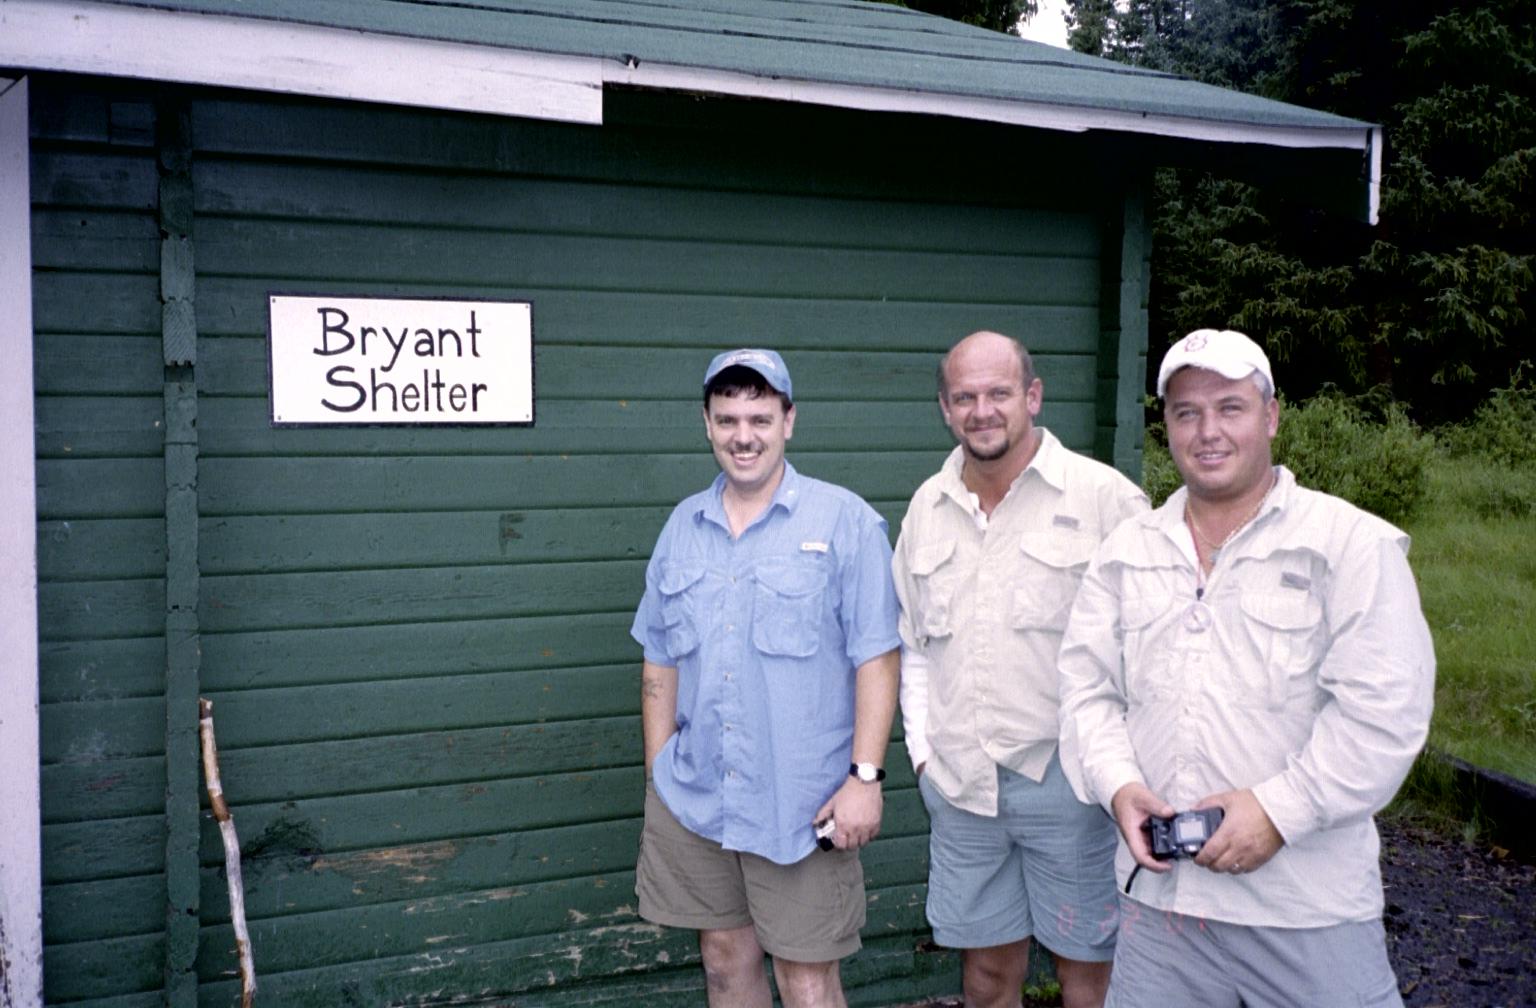 Tomscat, Huh?, and Fishnutz at Bryant Shelter